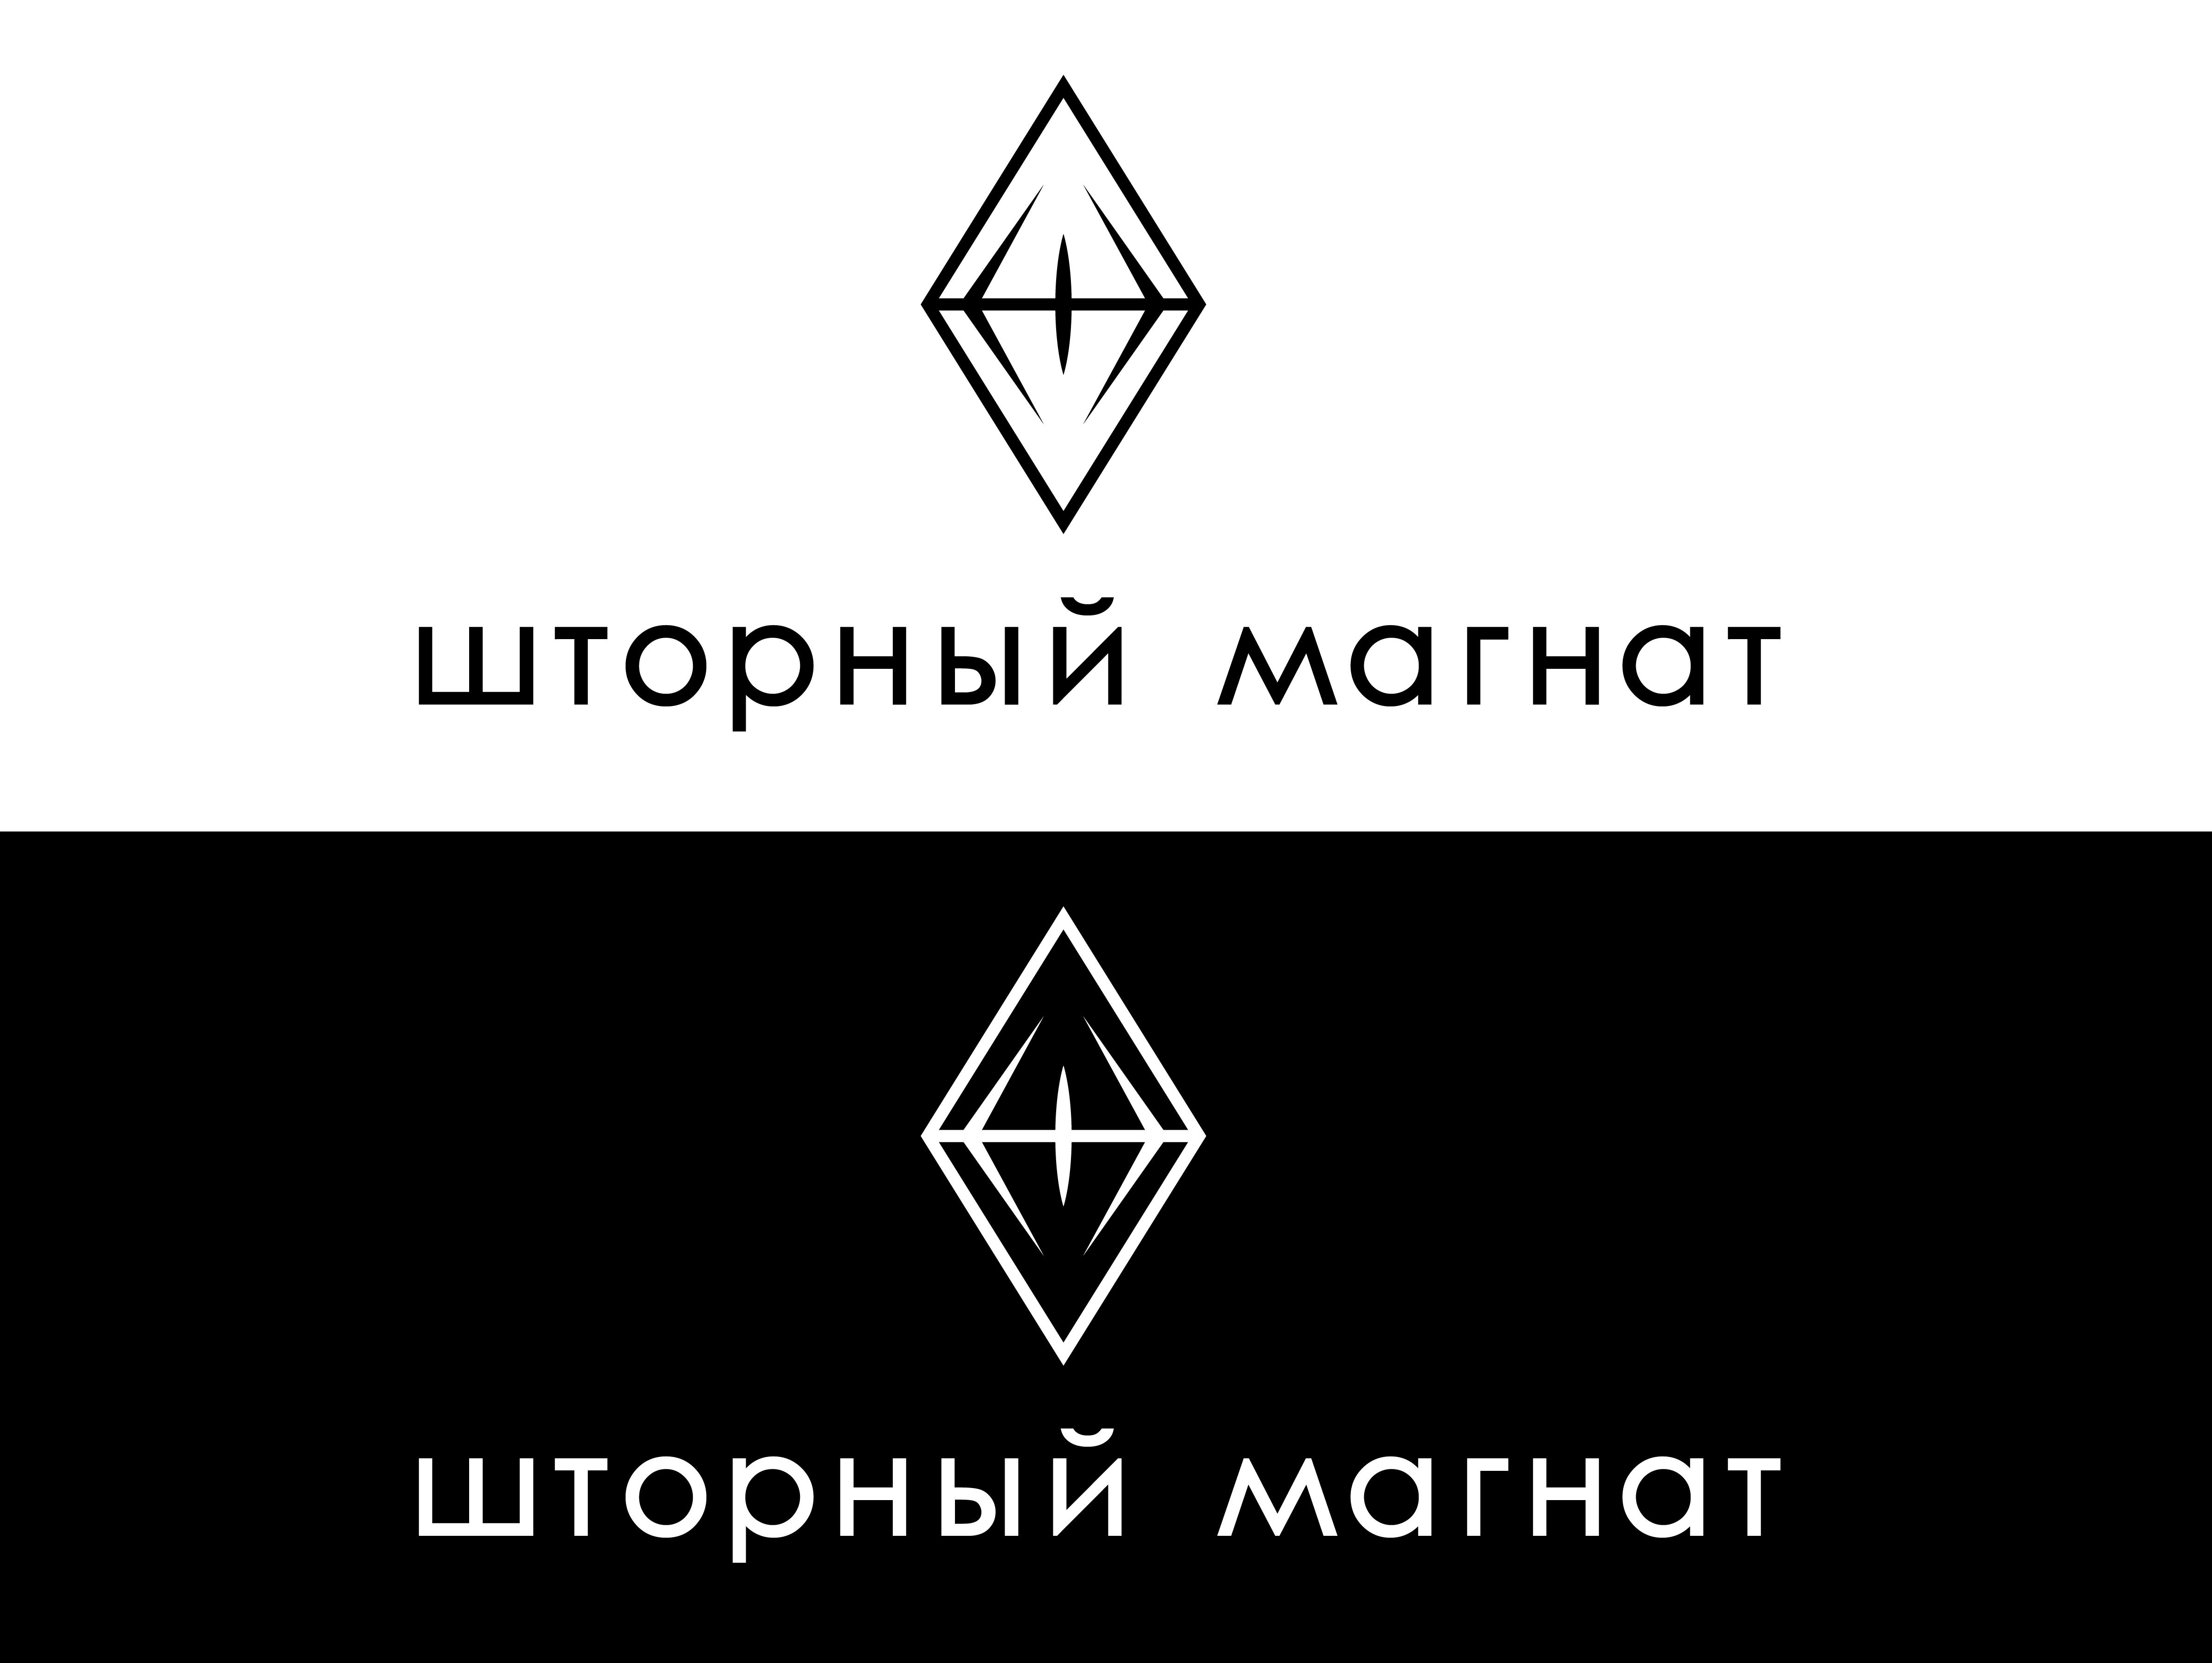 Логотип и фирменный стиль для магазина тканей. фото f_4595cd9e813dbf2a.jpg